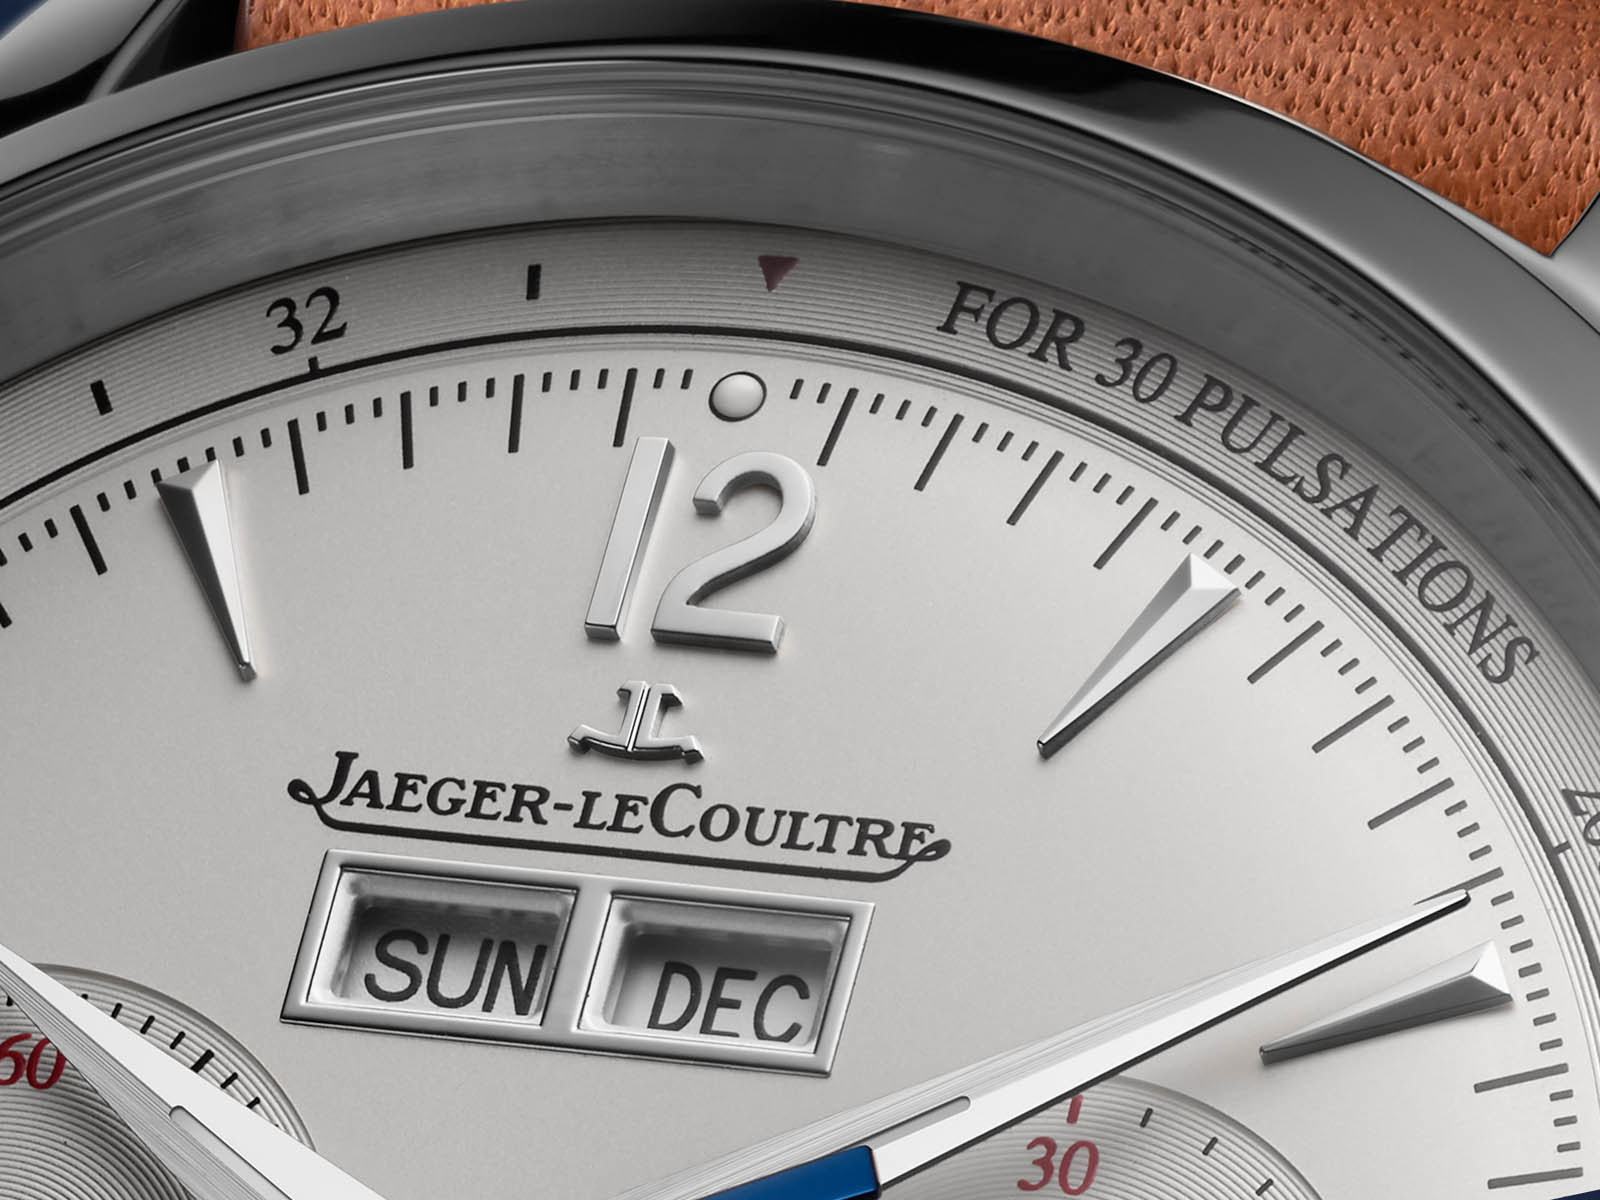 q4138420-jaeger-lecoultre-master-control-chronograph-calendar-5.jpg